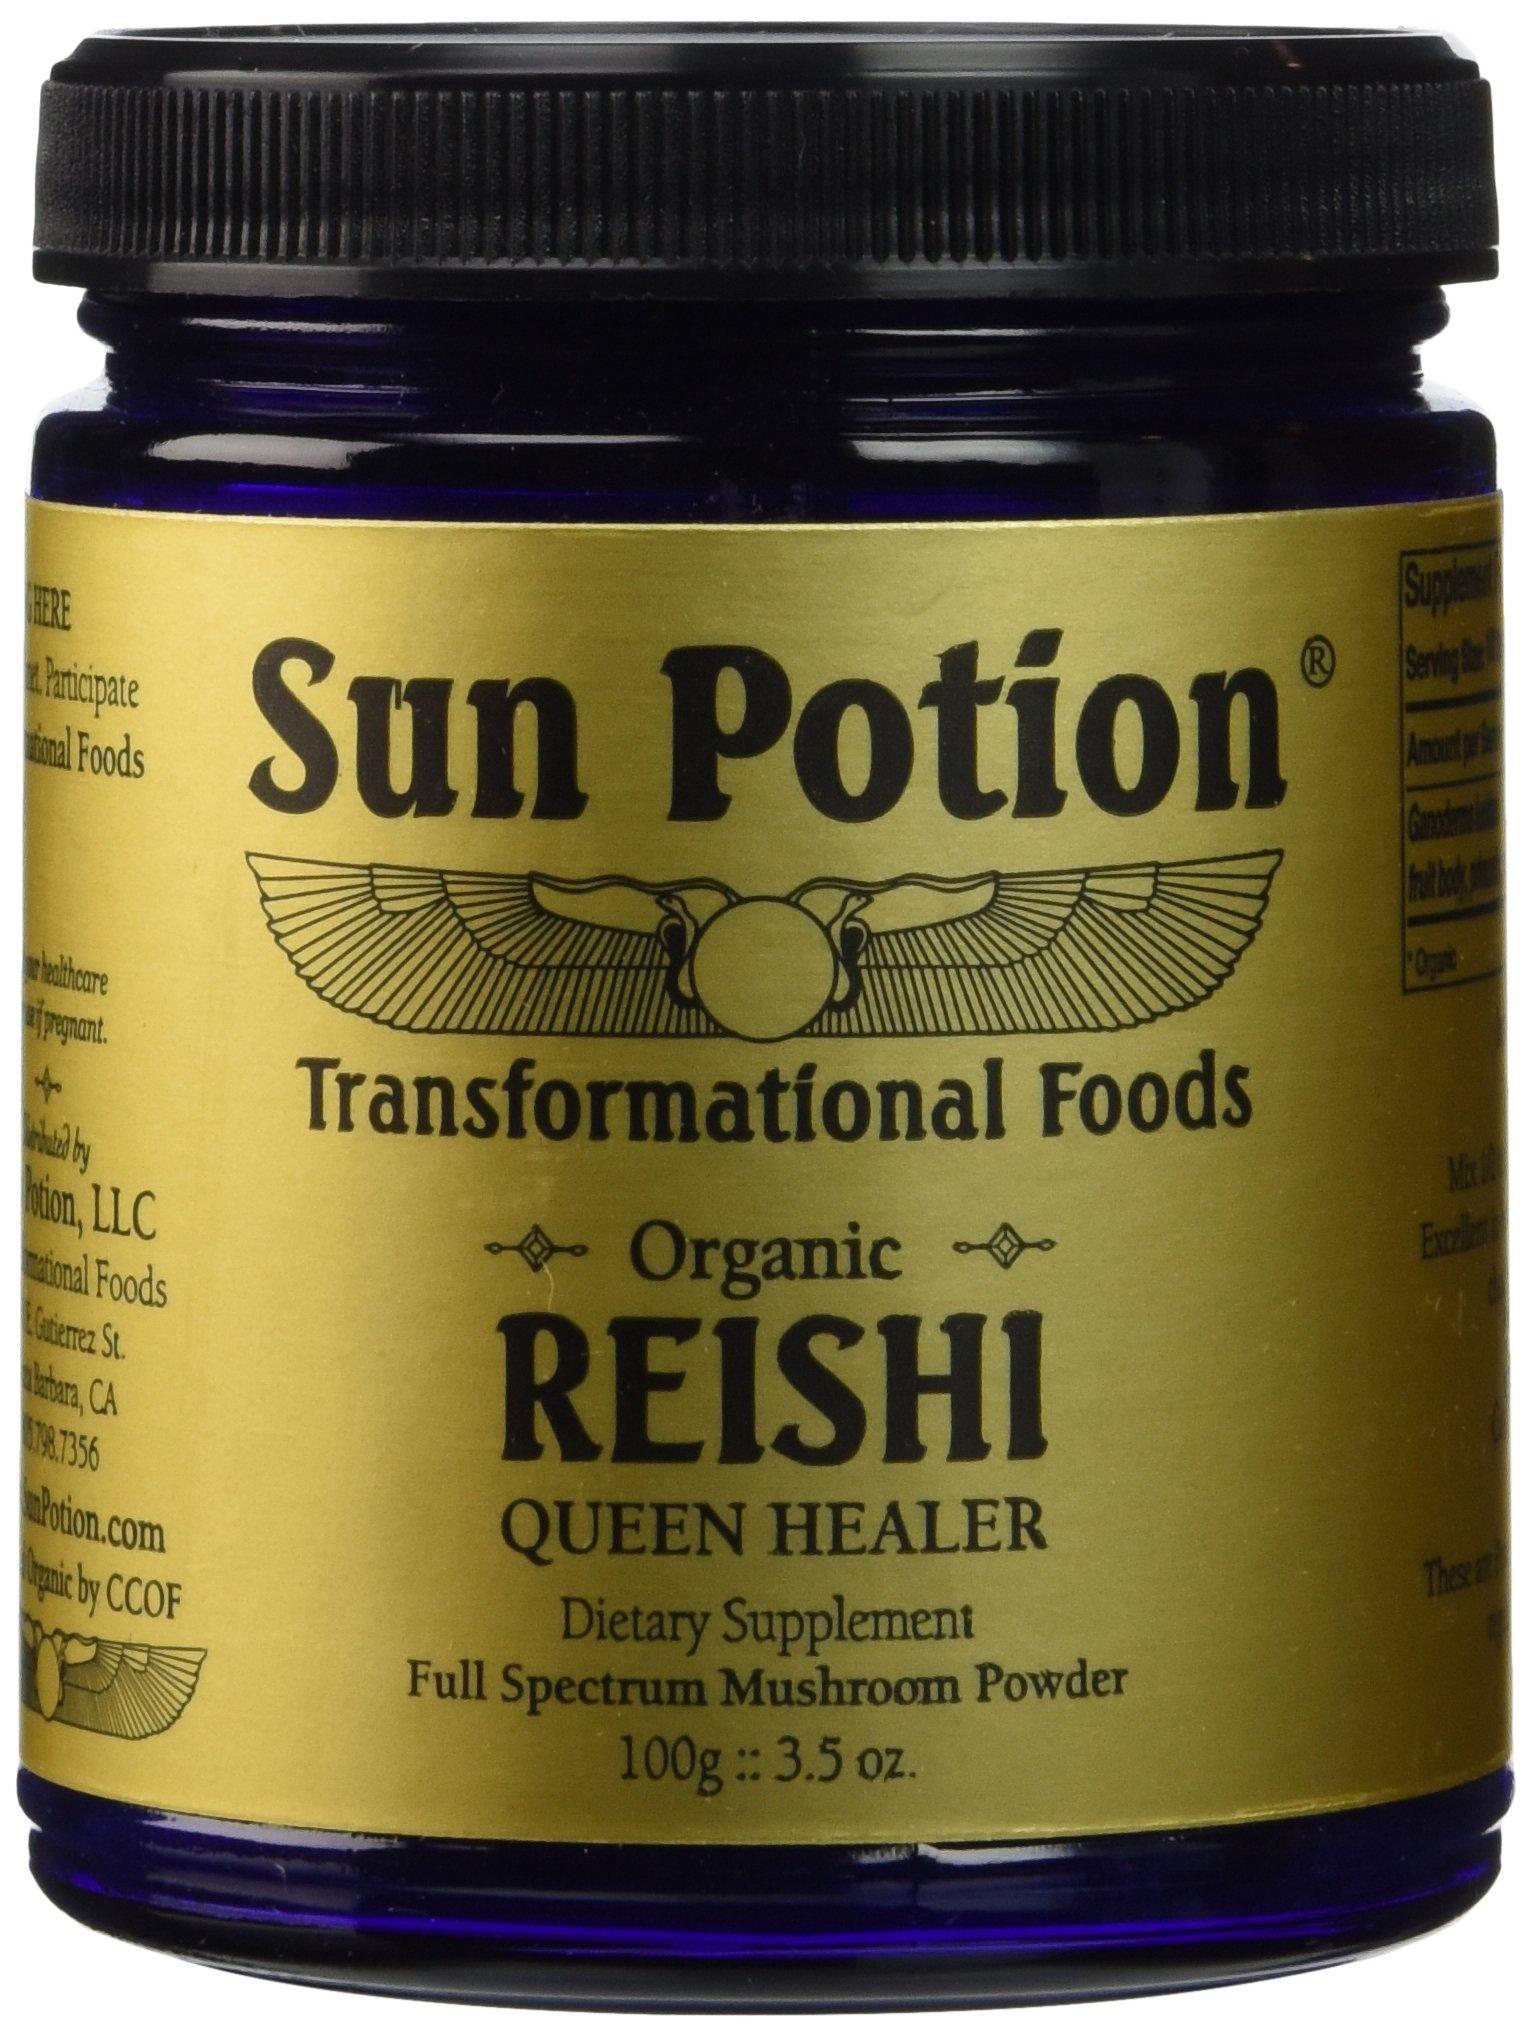 Sun Potion Organic Reishi Mushroom Powder - 100 Gram Jar